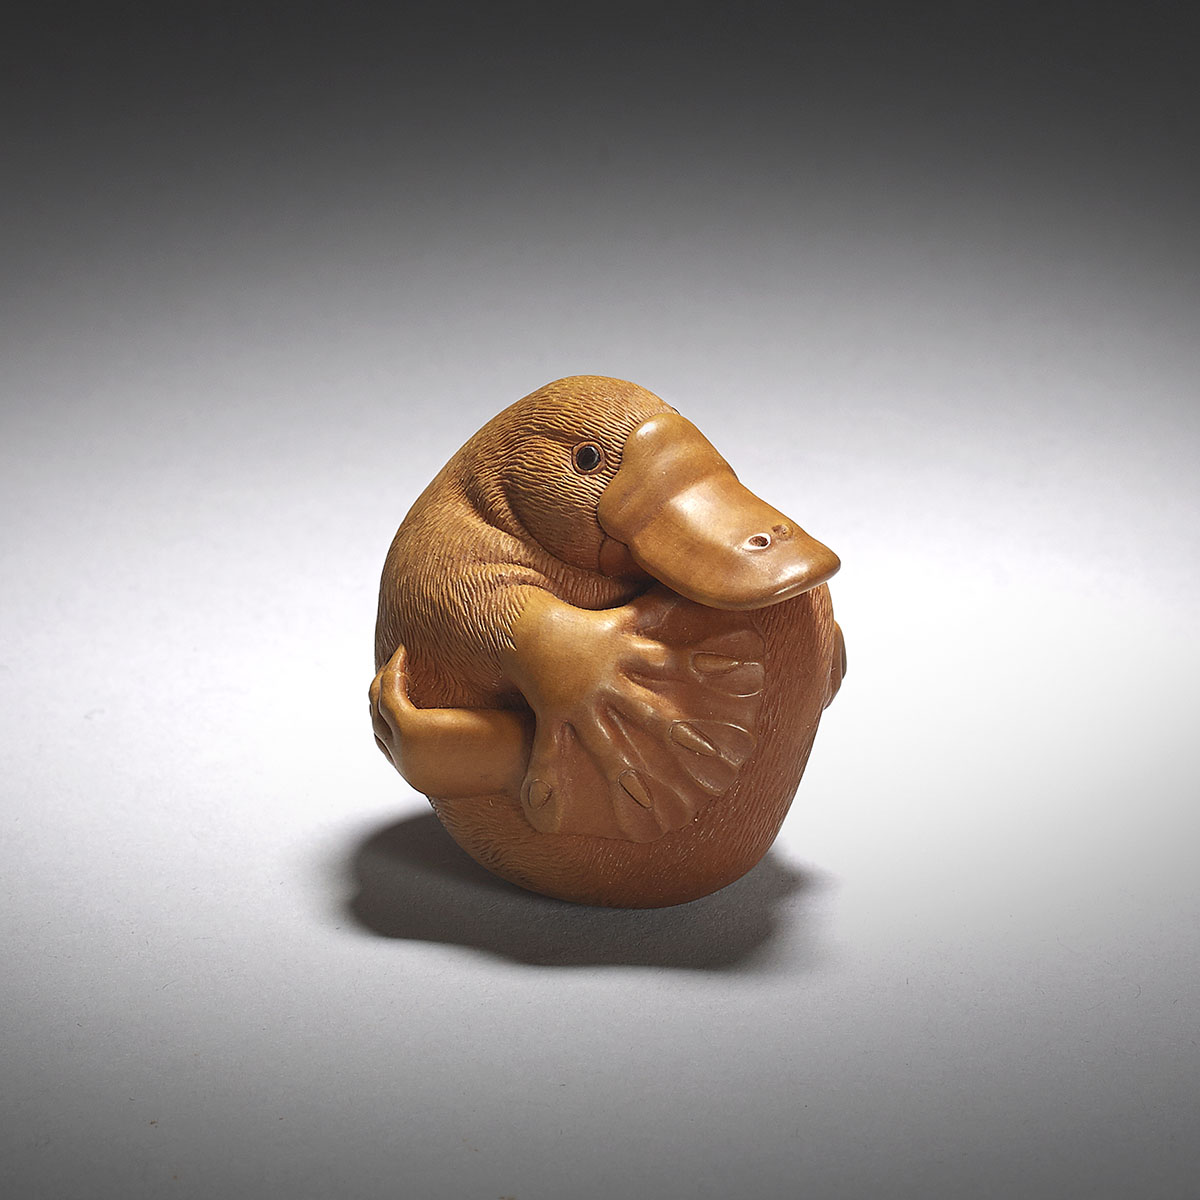 Susan Wraight, Boxwood netsuke of a duckbill platypus